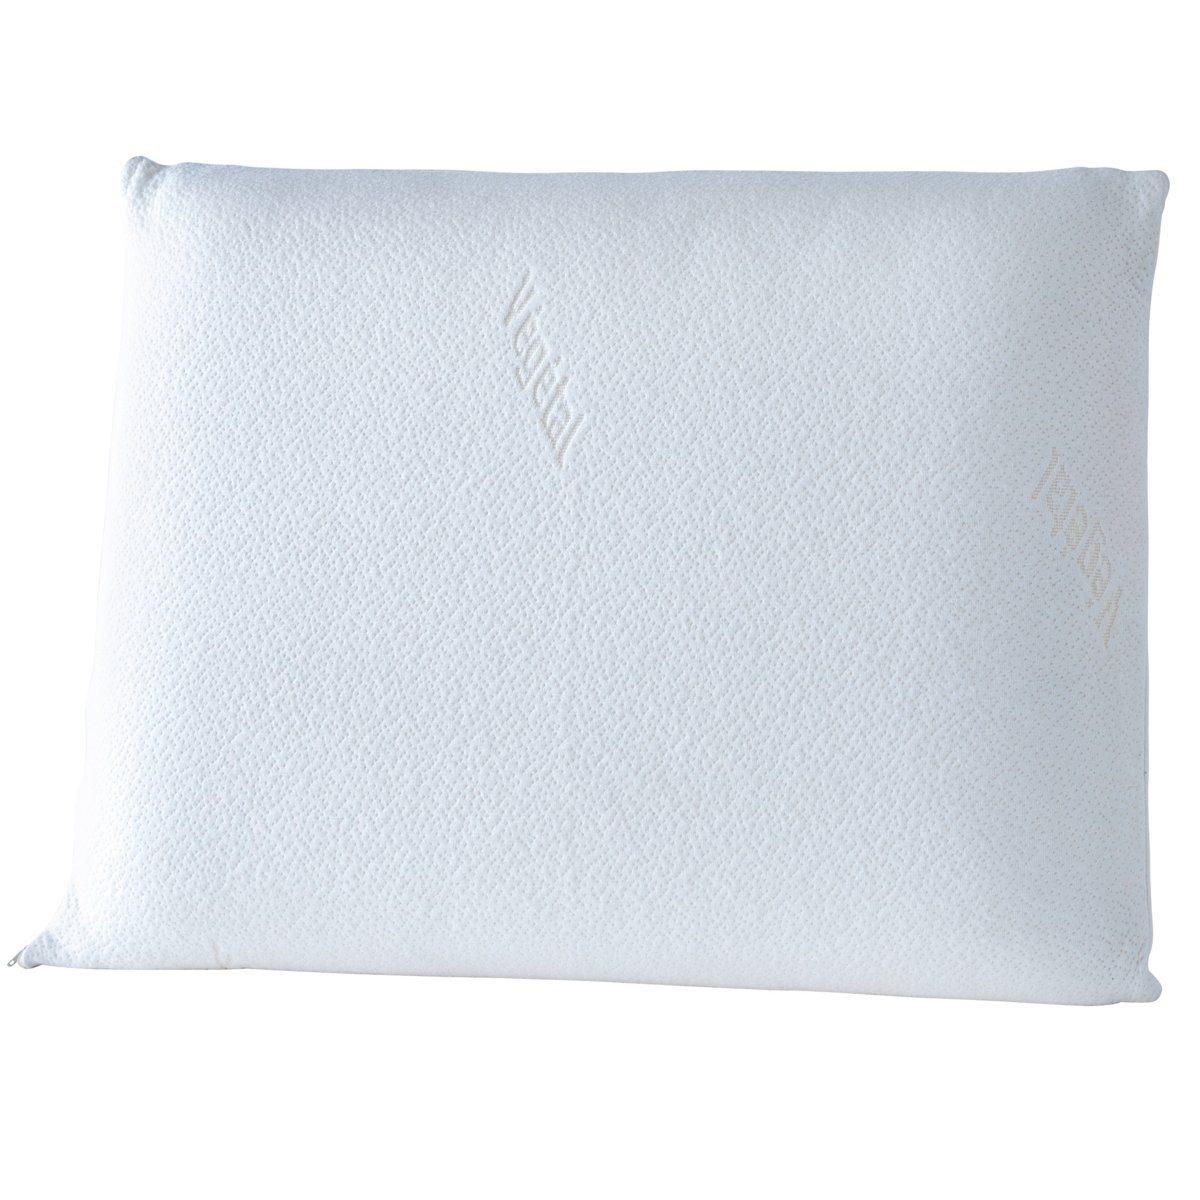 Подушка безворсовая с памятью формы